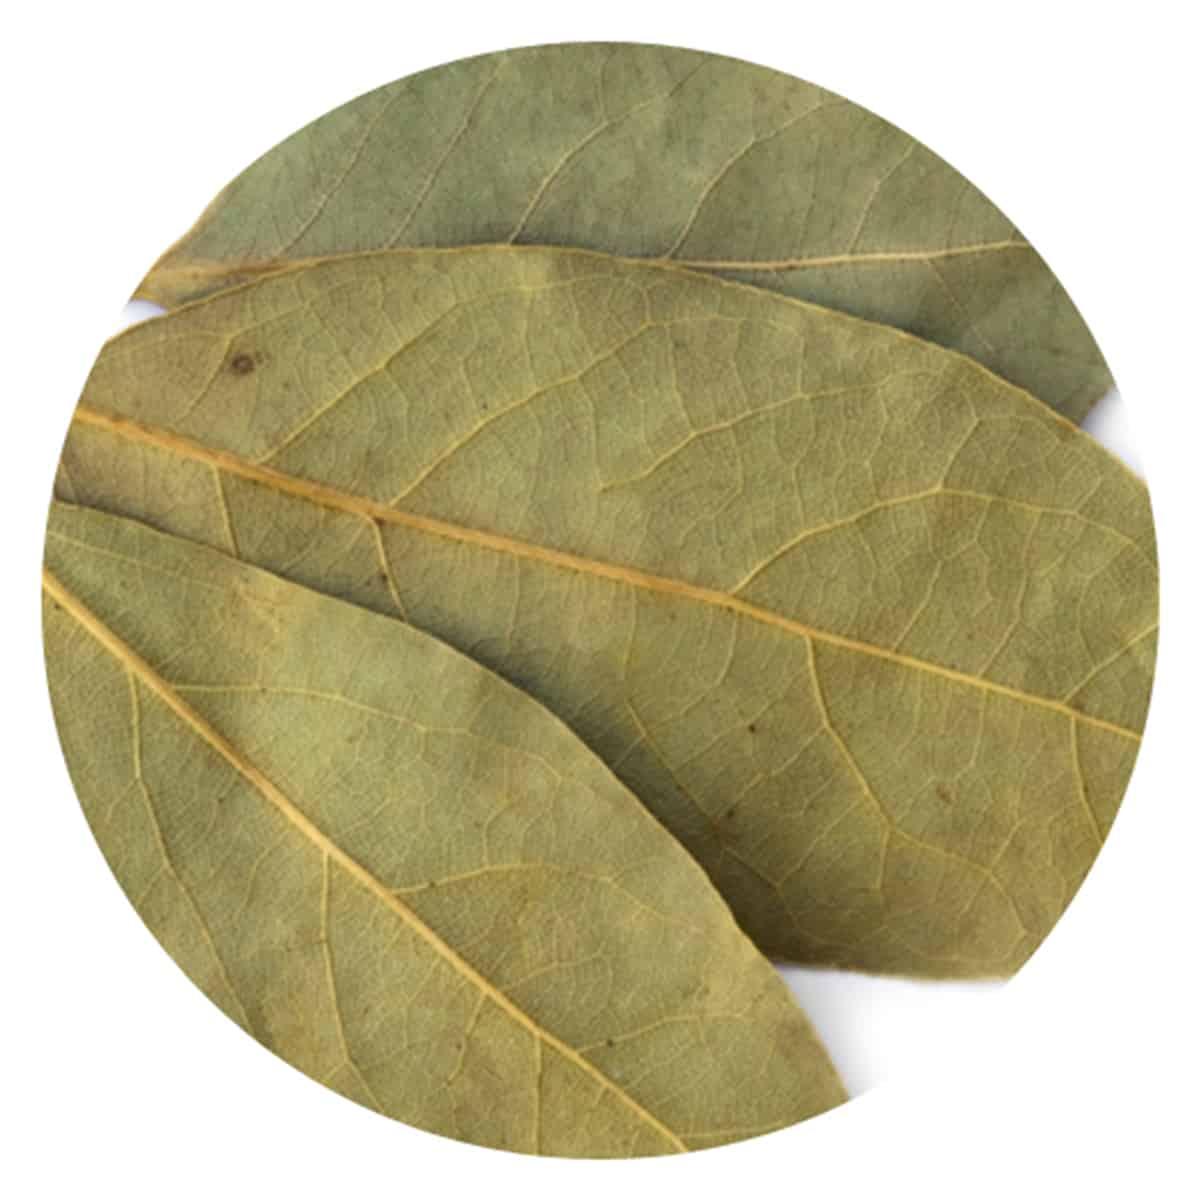 Buy IAG Foods Dried Bay Leaves (Tejpatta) - 1 kg